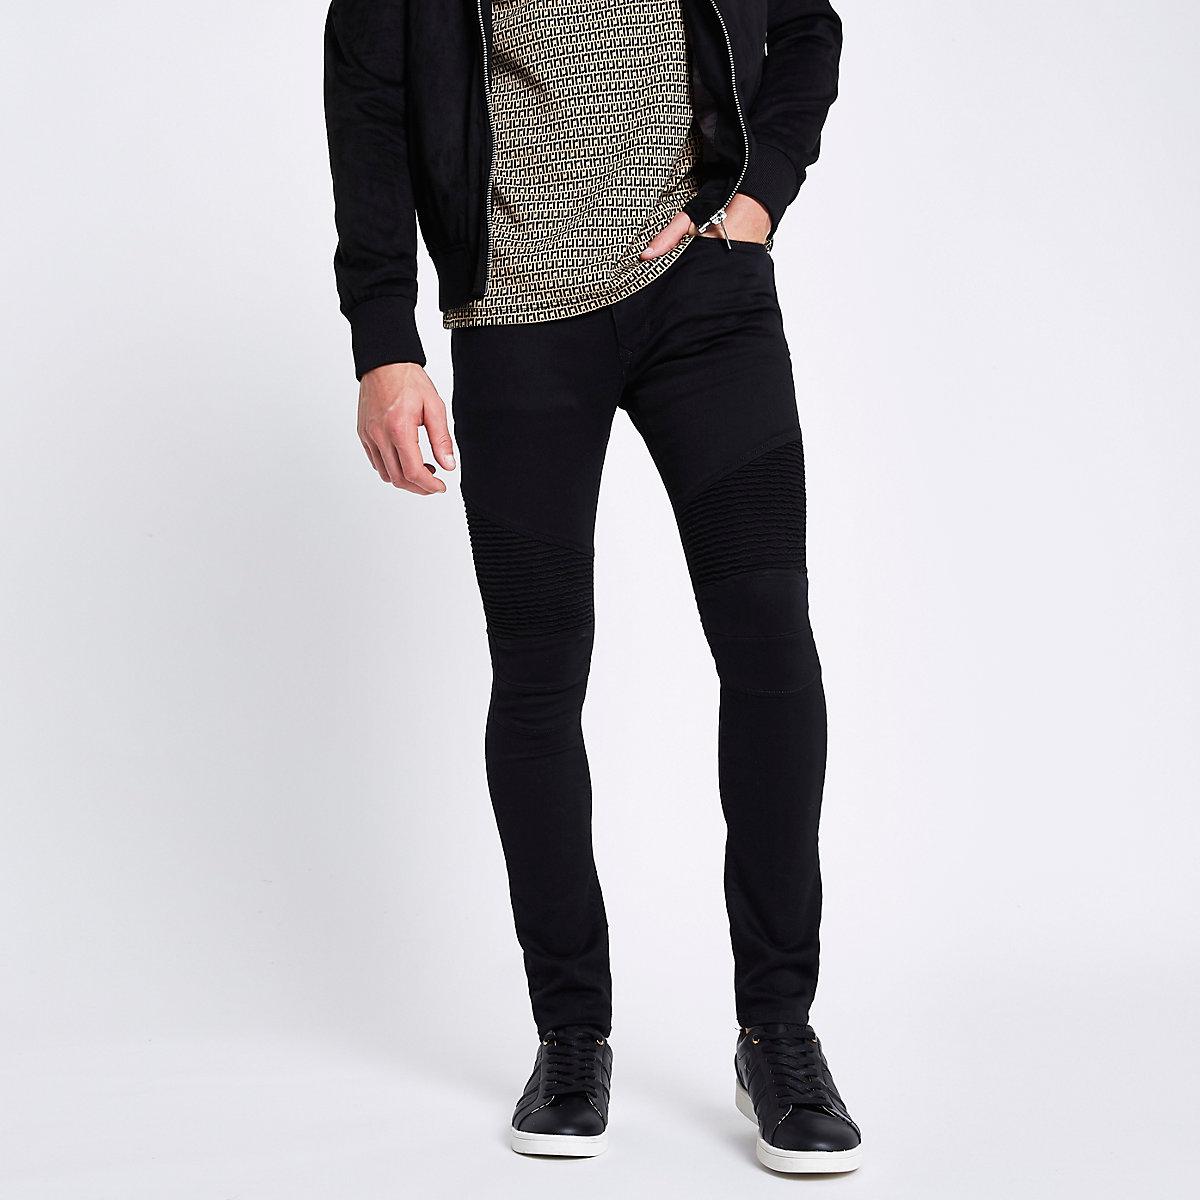 Danny – Jean super skinny noir style motard